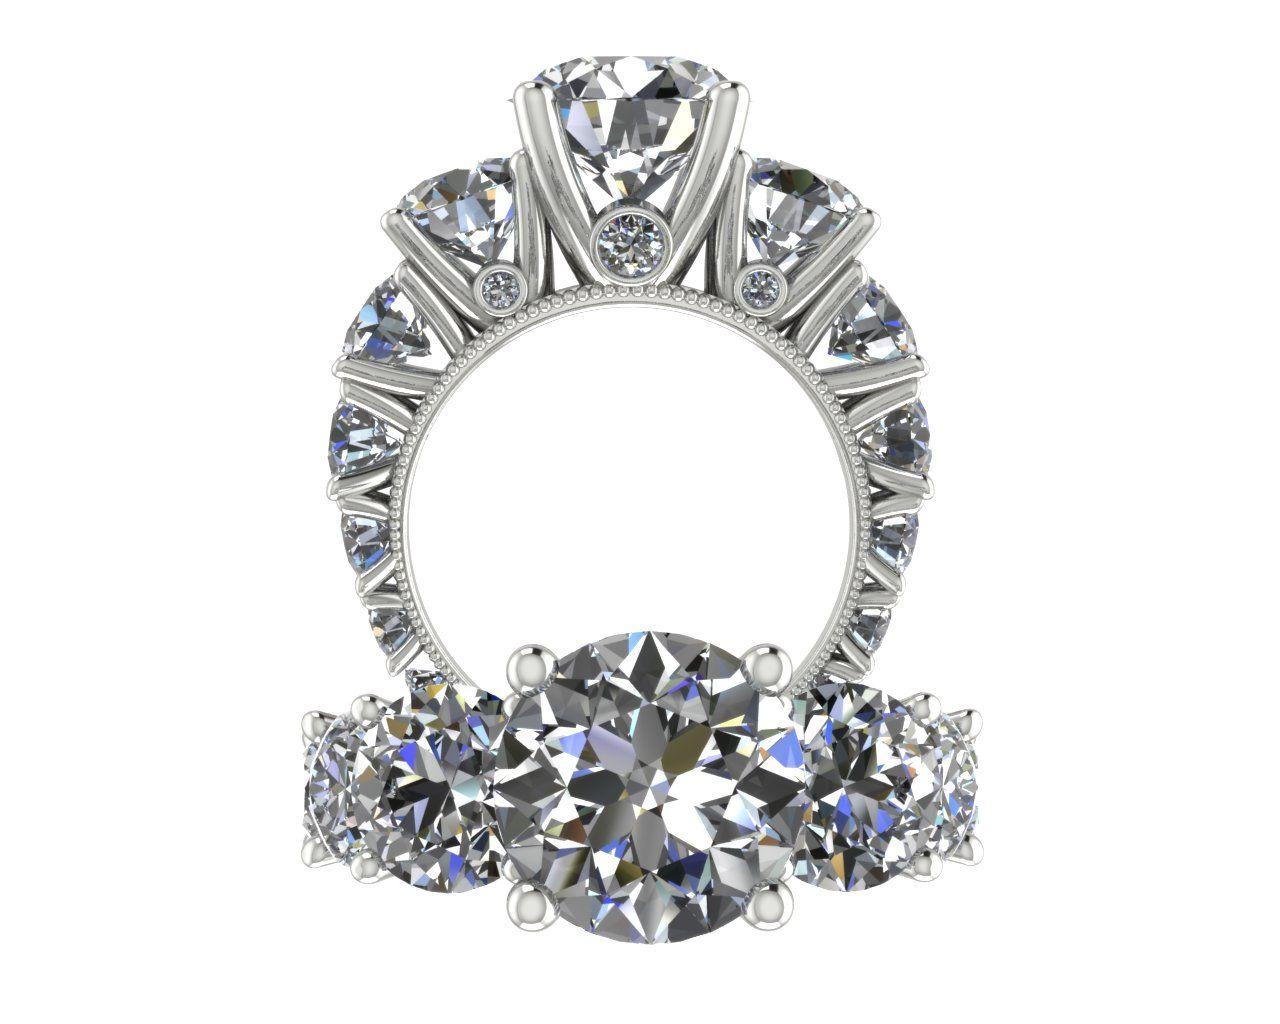 Million dollar ring j david jewelry jewelry rings